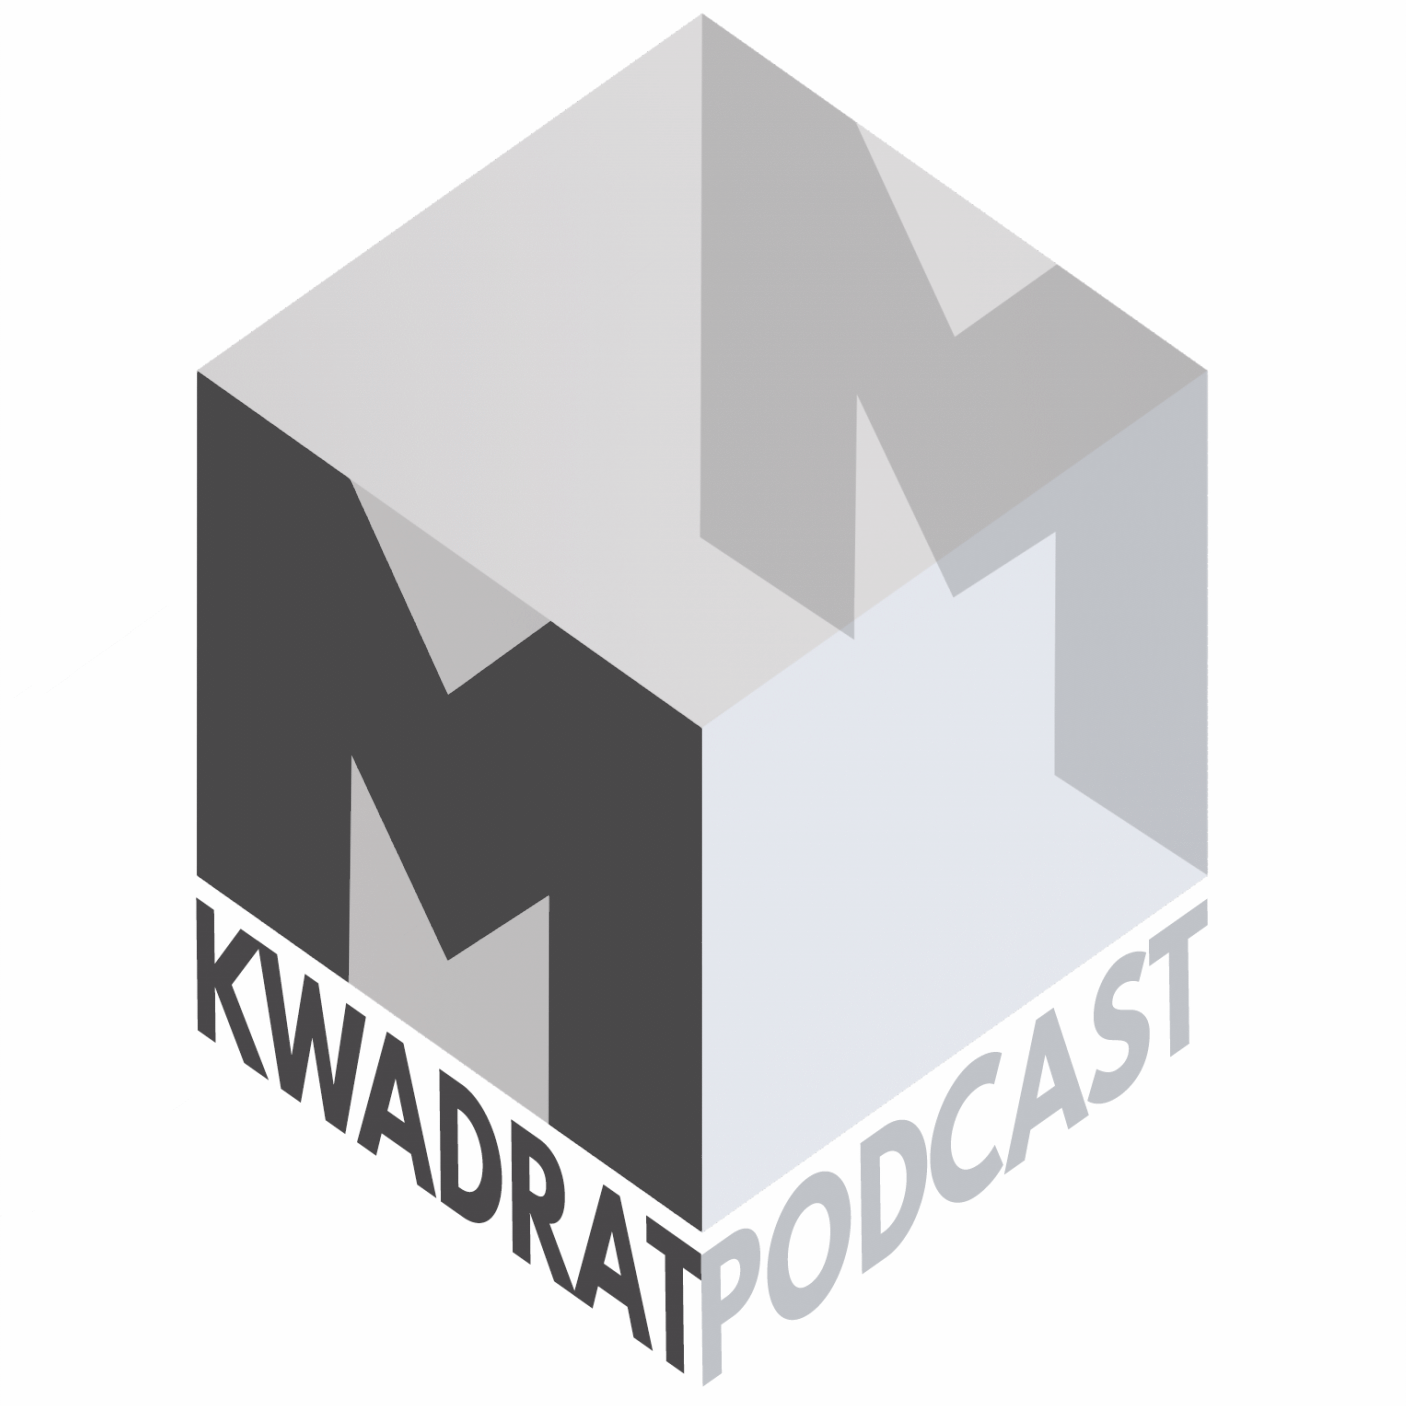 MKwadrat Podcast